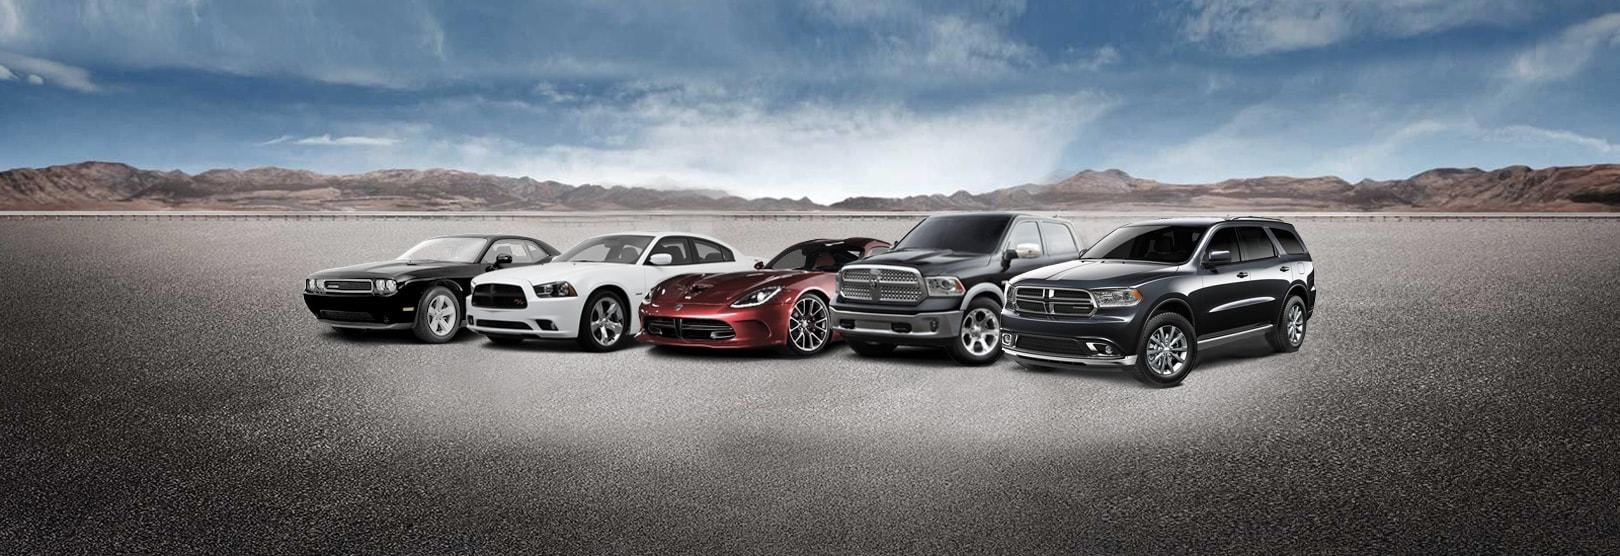 2017 Dodge Lineup